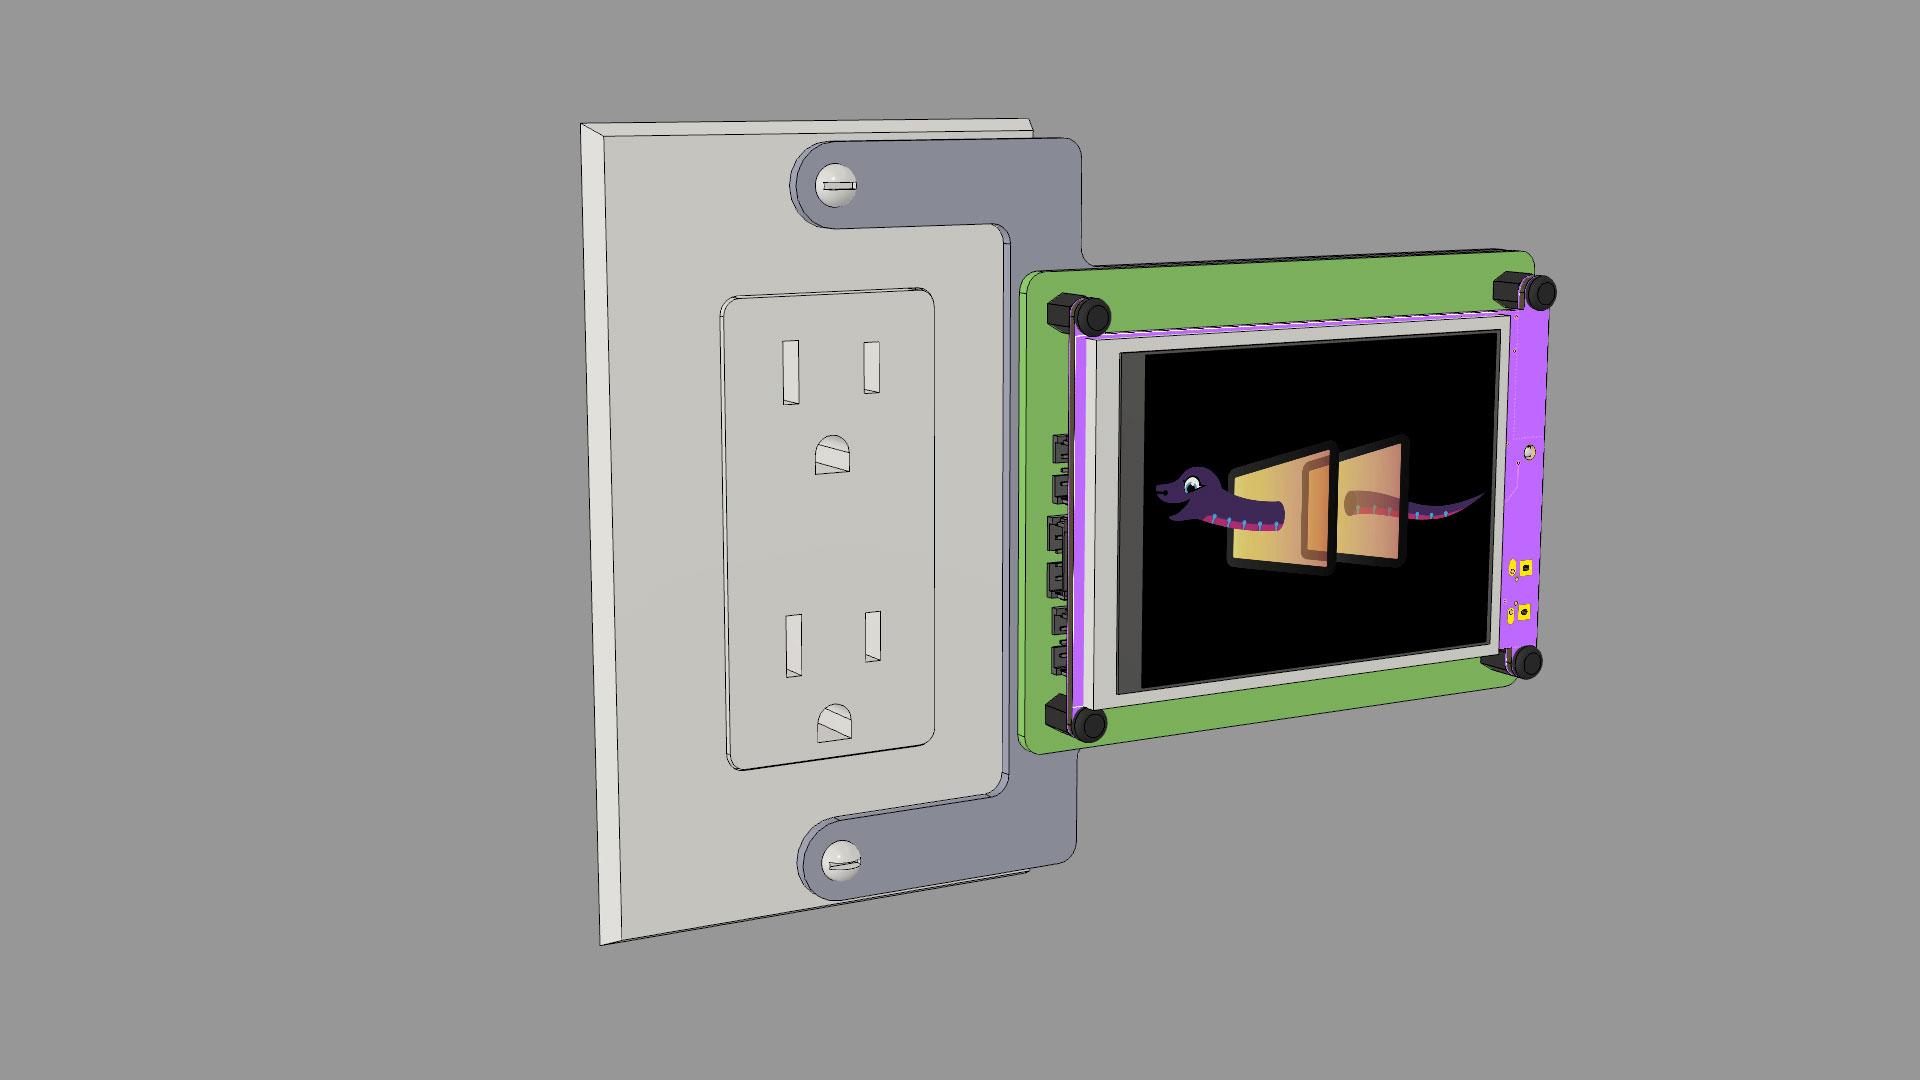 3d_printing_lxl-outlet-thumb.jpg